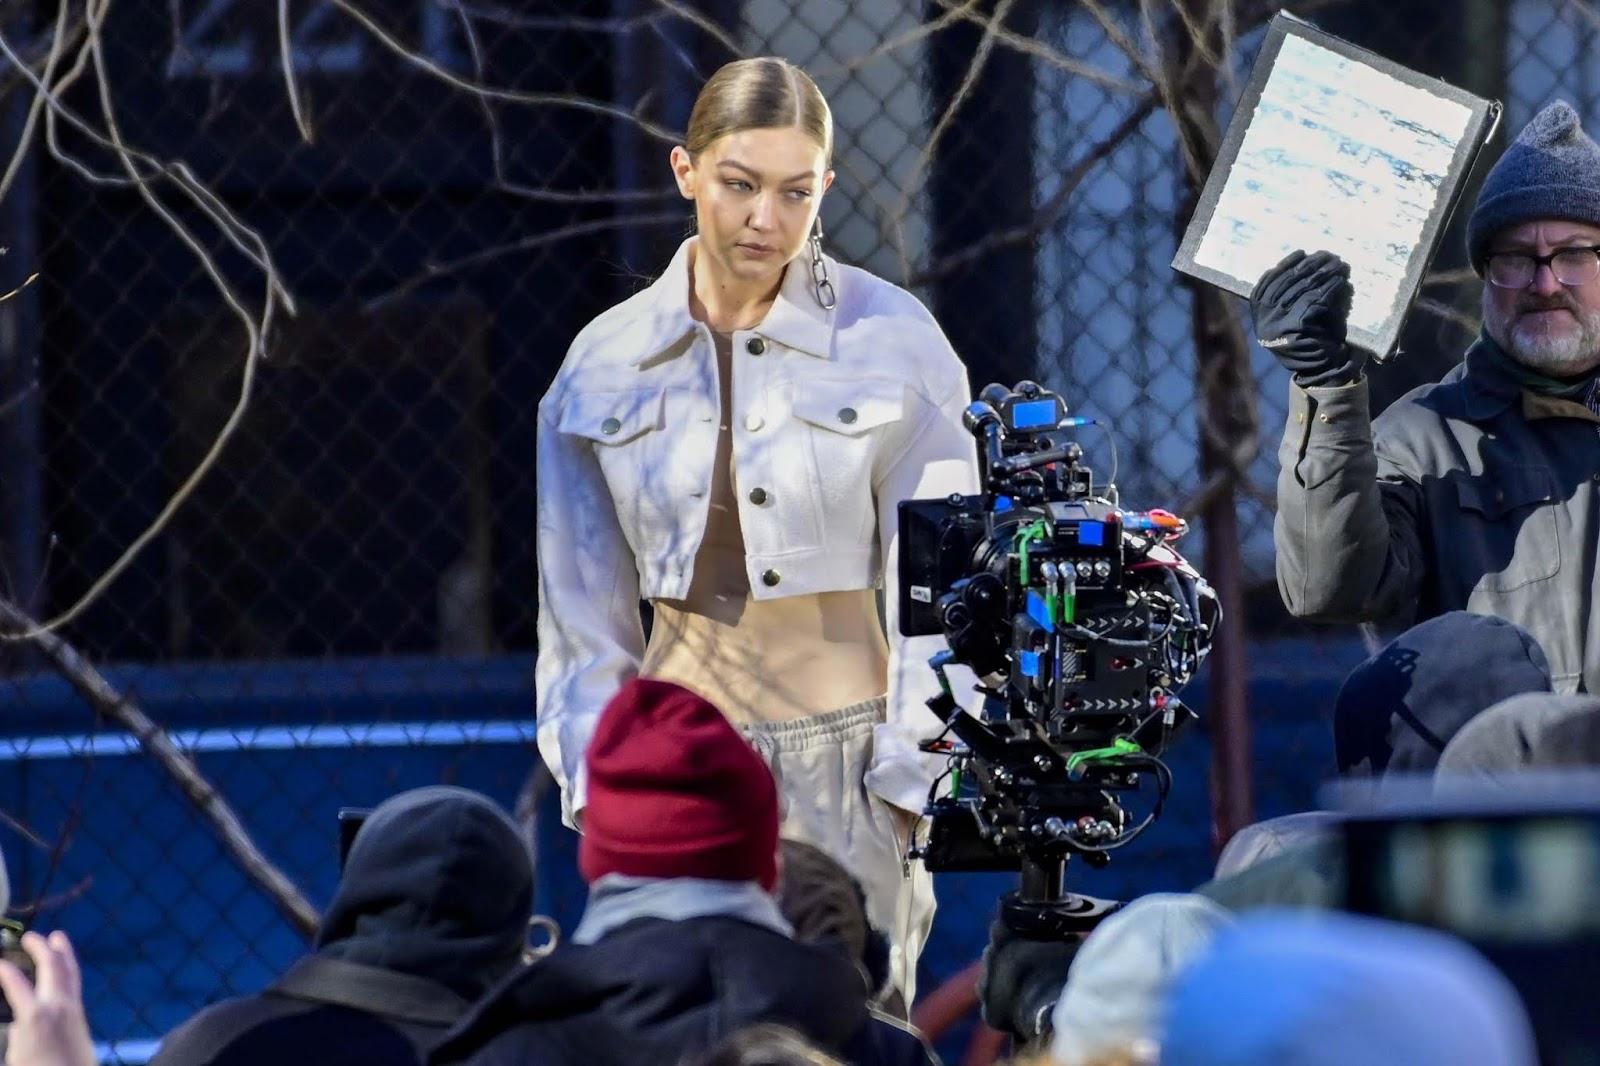 Gigi Hadid doing a photoshoot in NYC - 01/11/2019